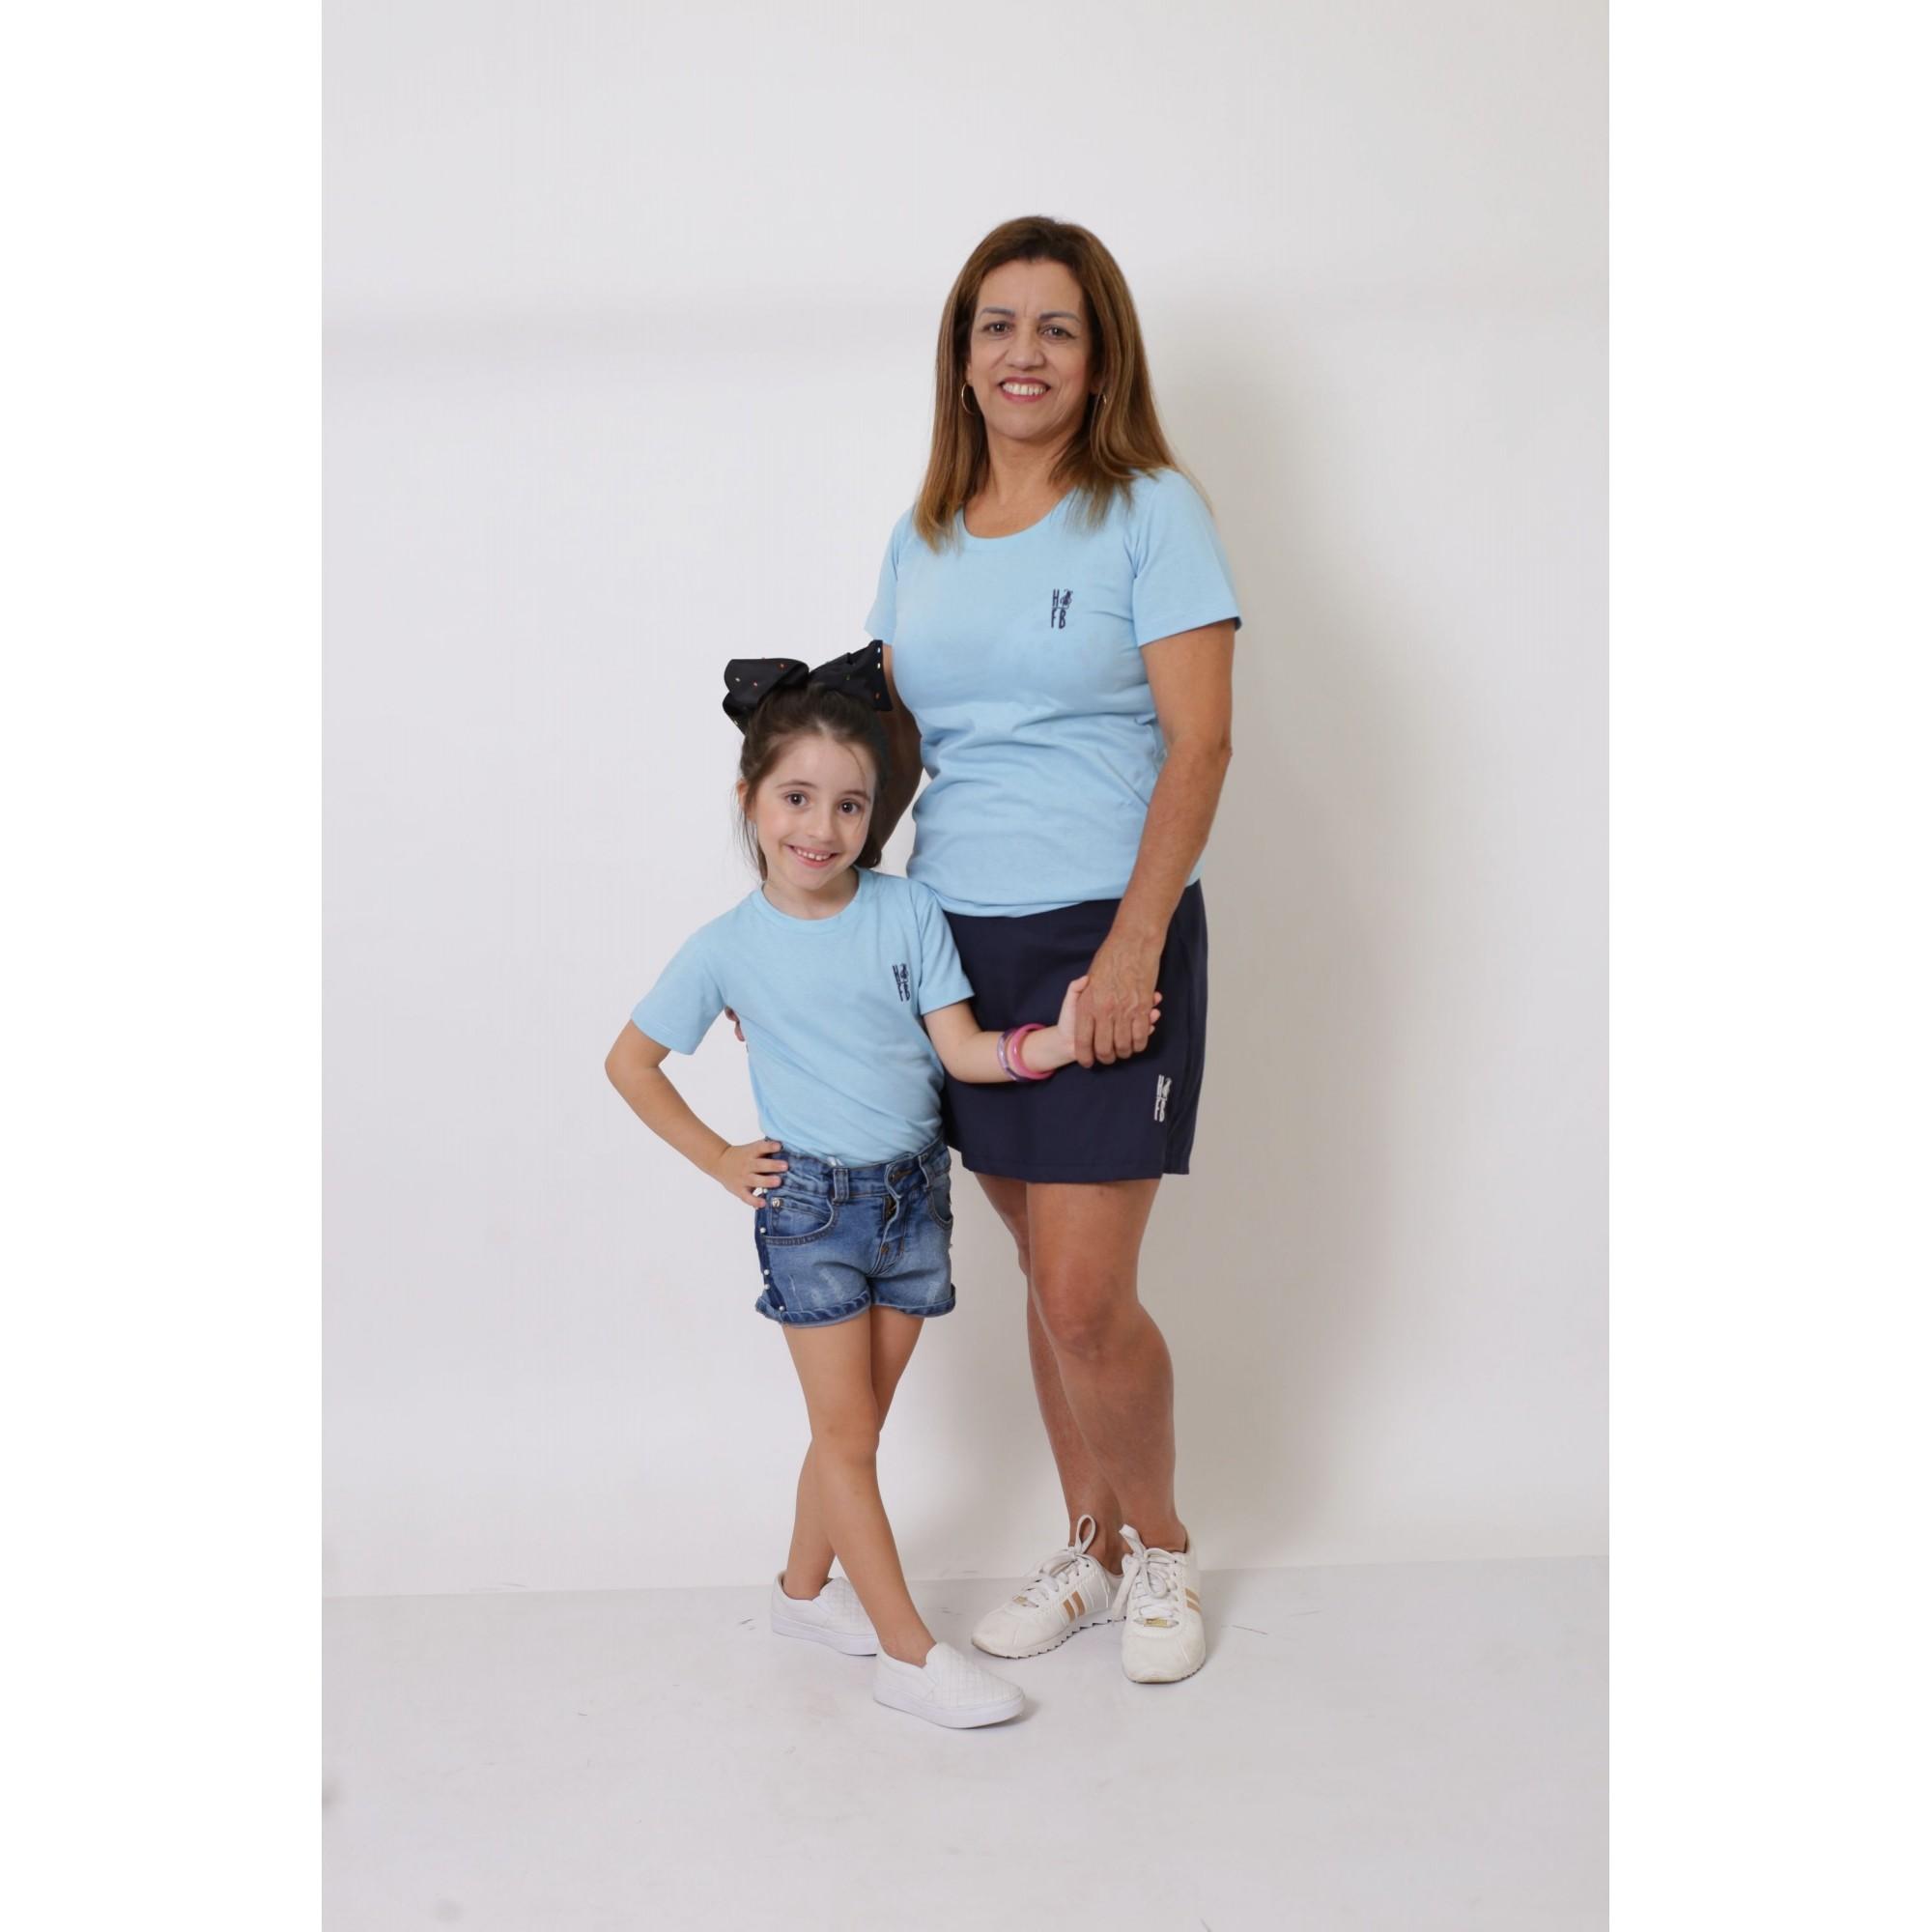 AVÓ E NETA > Kit 02 Peças T-Shirts - Azul Bebê [Coleção Tal Avó Tal Neta]  - Heitor Fashion Brazil